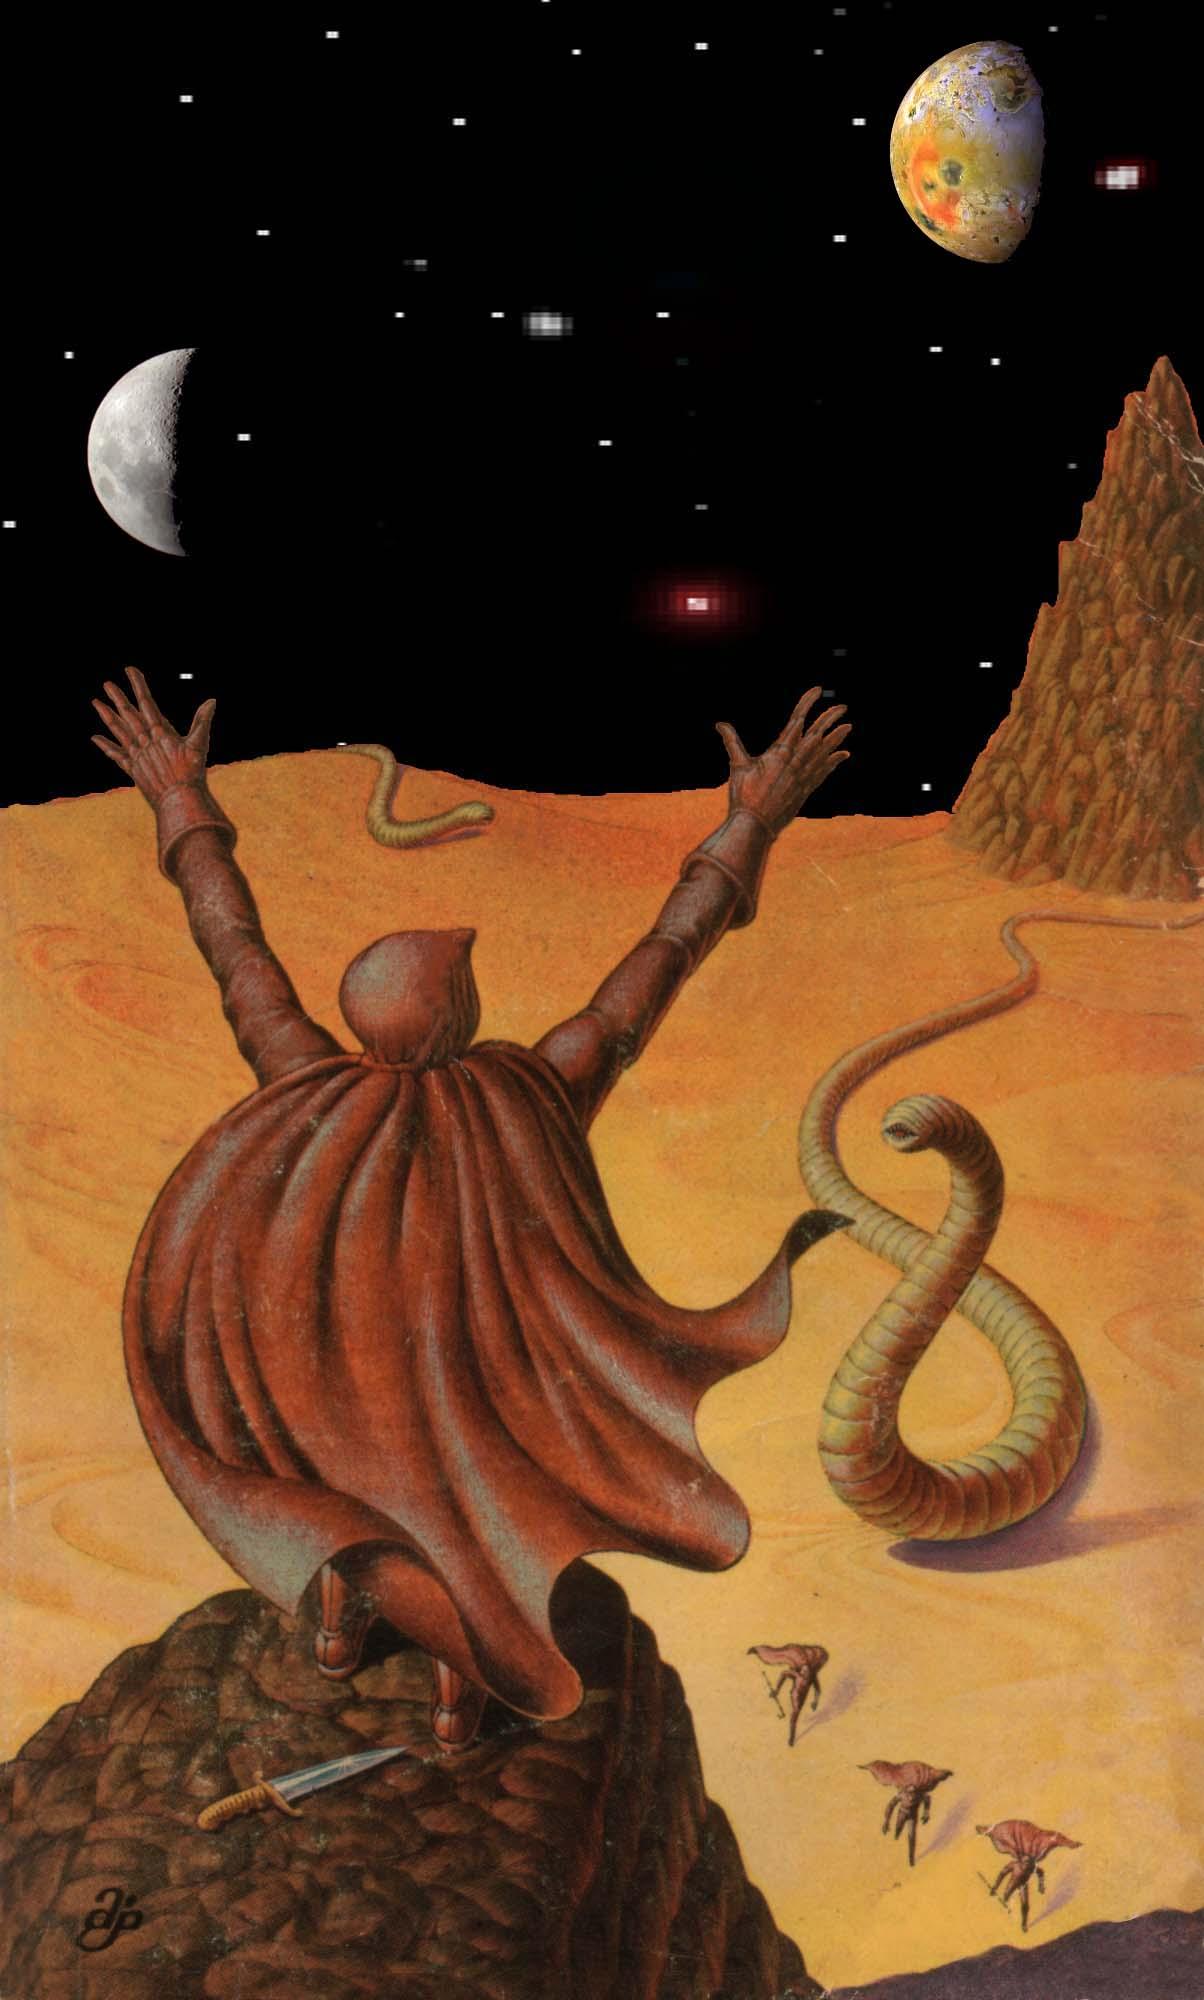 DUNE: Paul-Muad'Dib and the Worms (Art by John Schoenherr... Computer Embellishments by J.C. Maçek III)